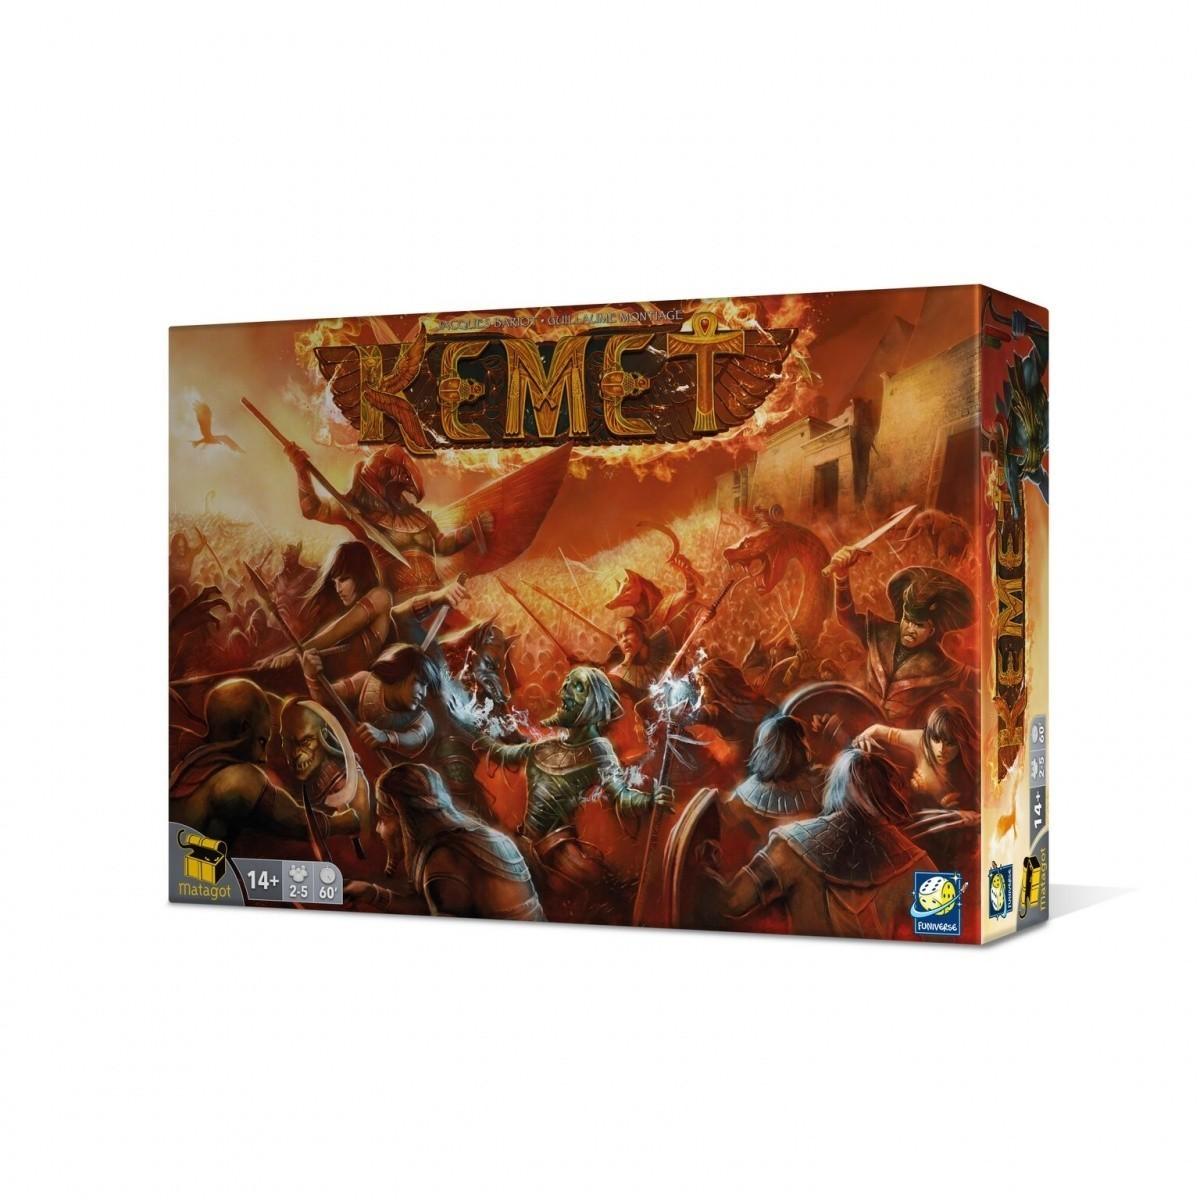 Kemet (edycja 2019)